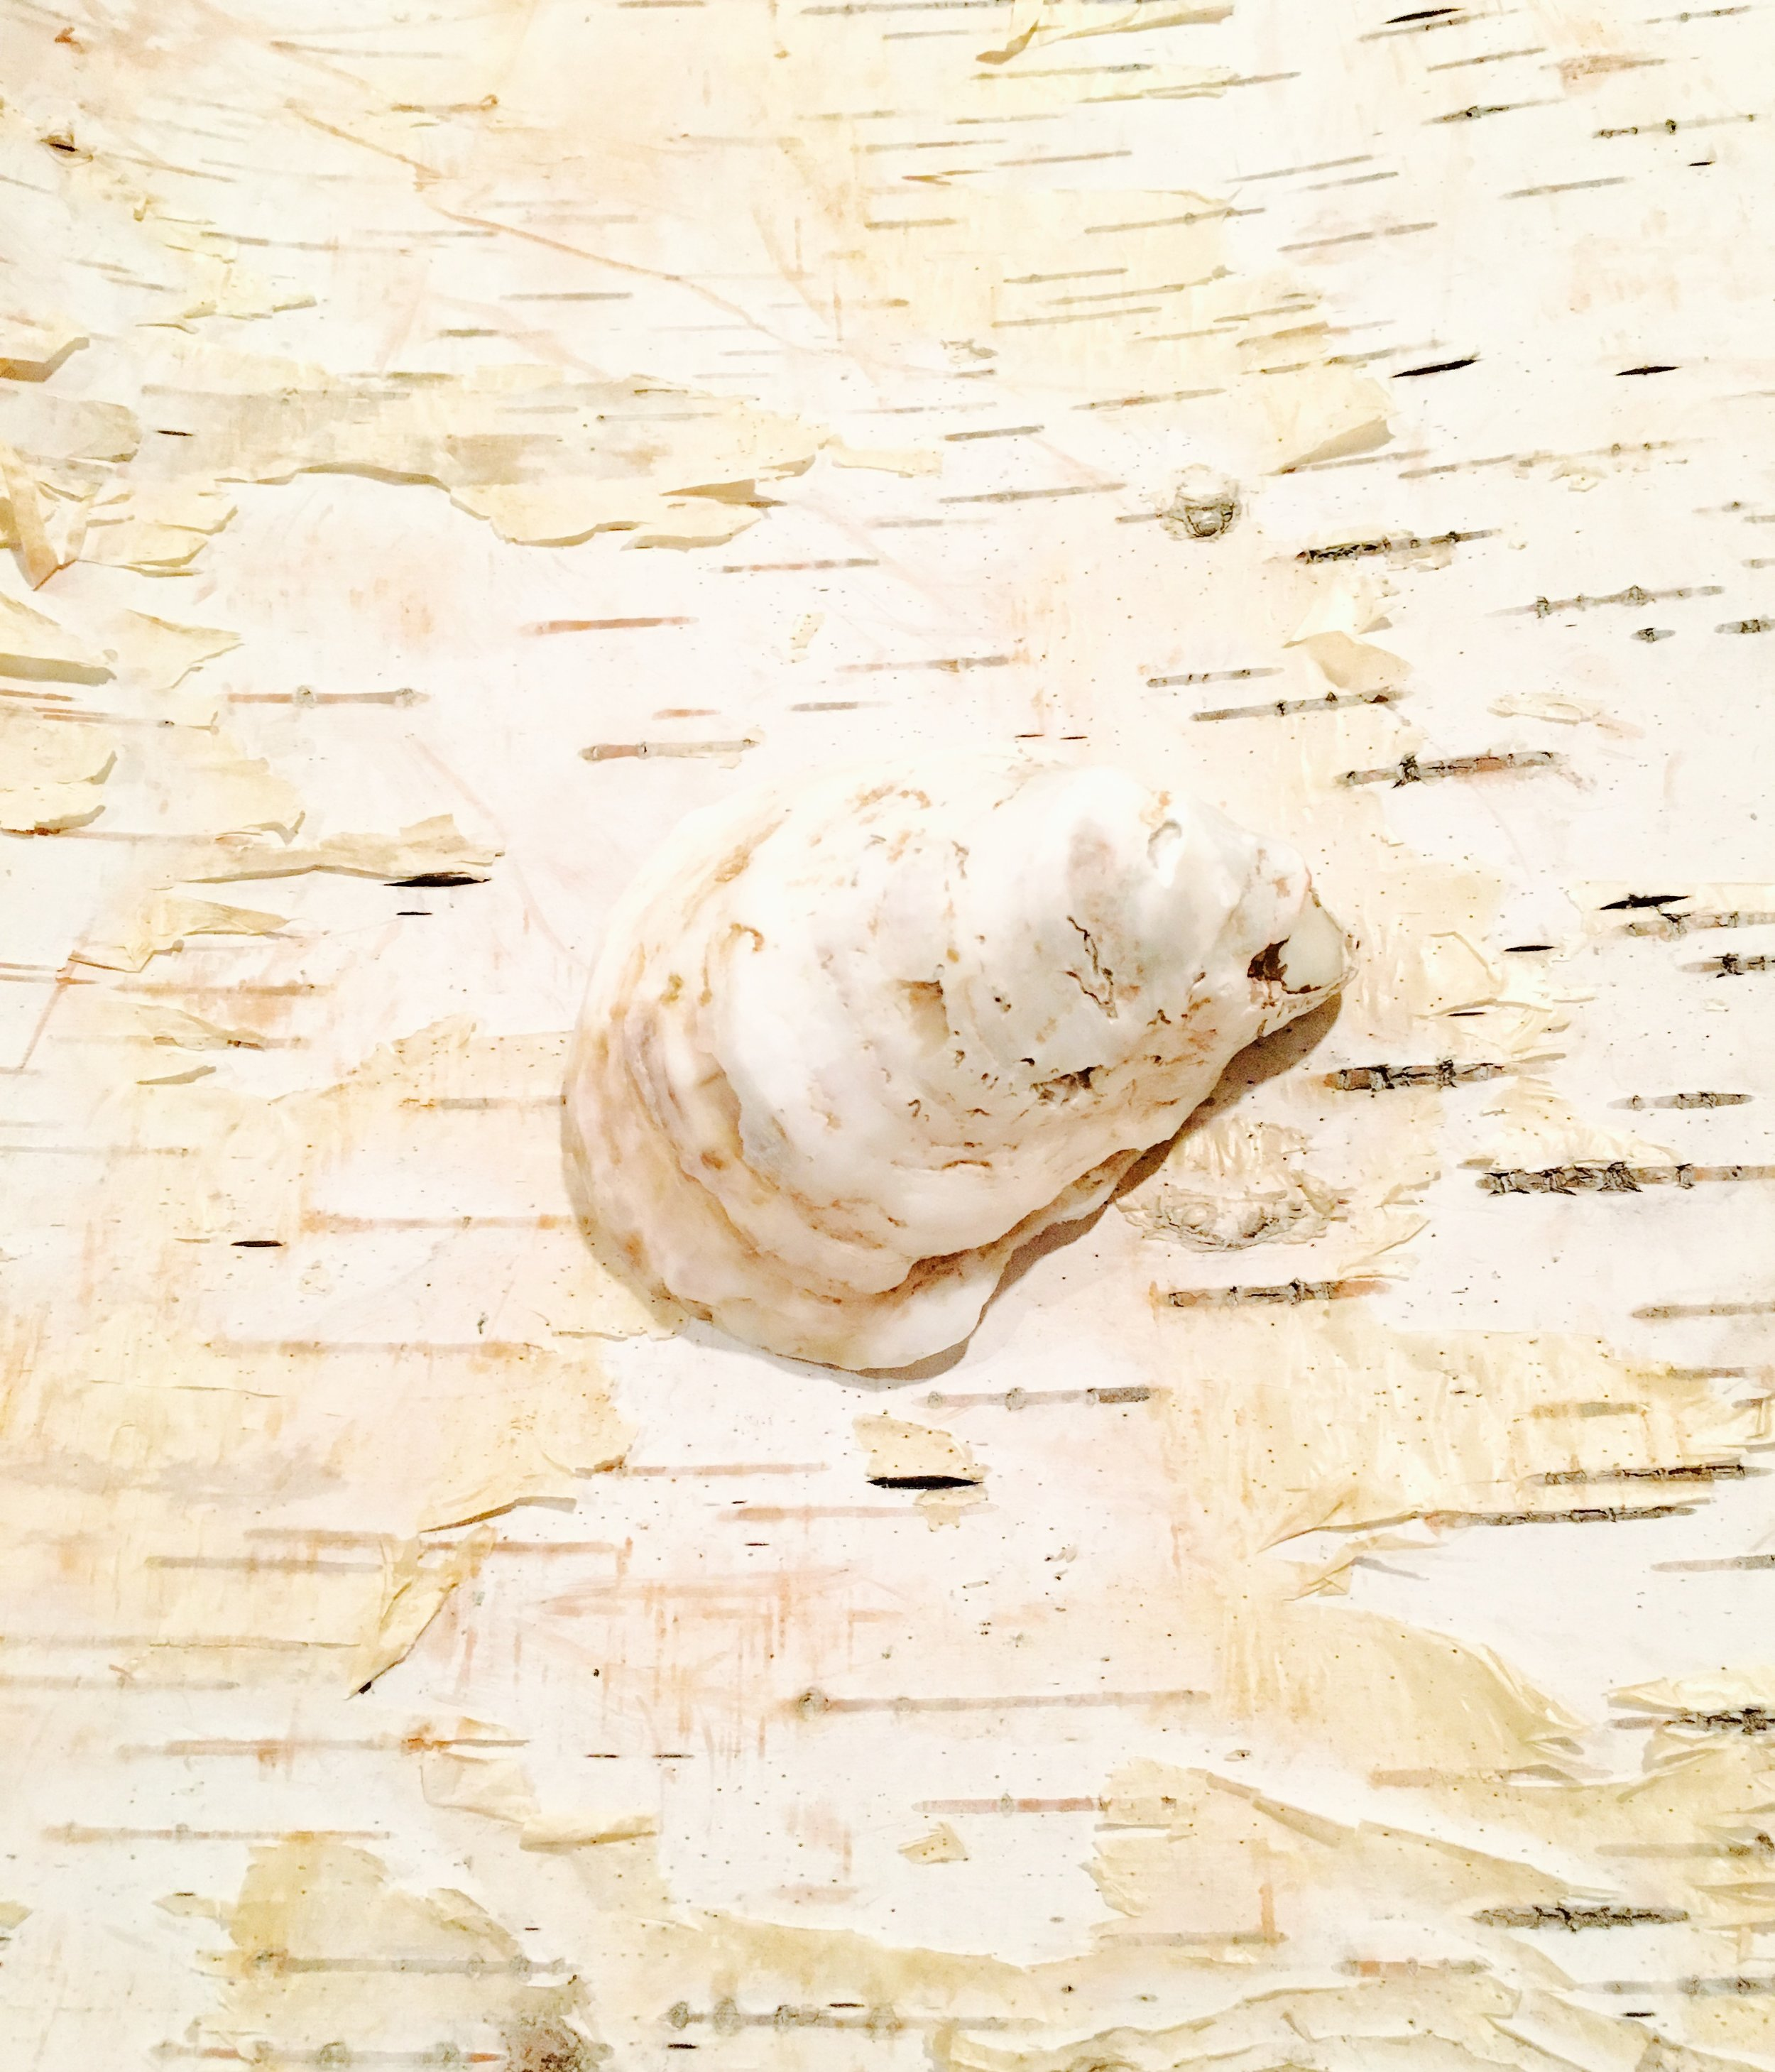 Oyster + Birch Study